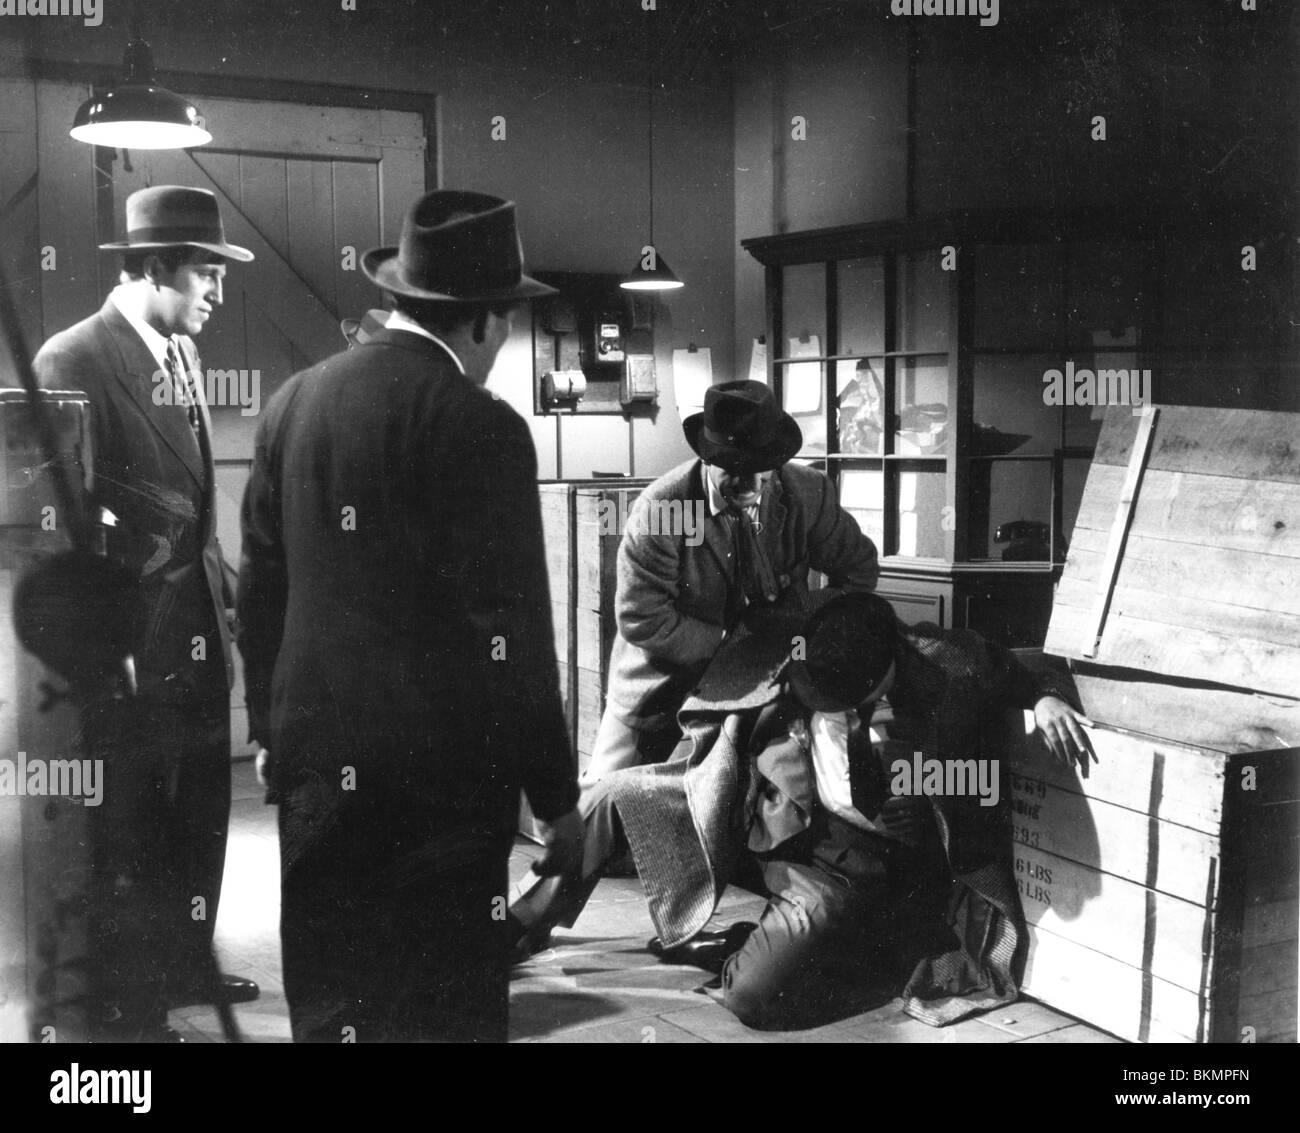 INTERNATIONAL DETECTIVE (TV) ARTHUR FLEMING INDT 003P - Stock Image